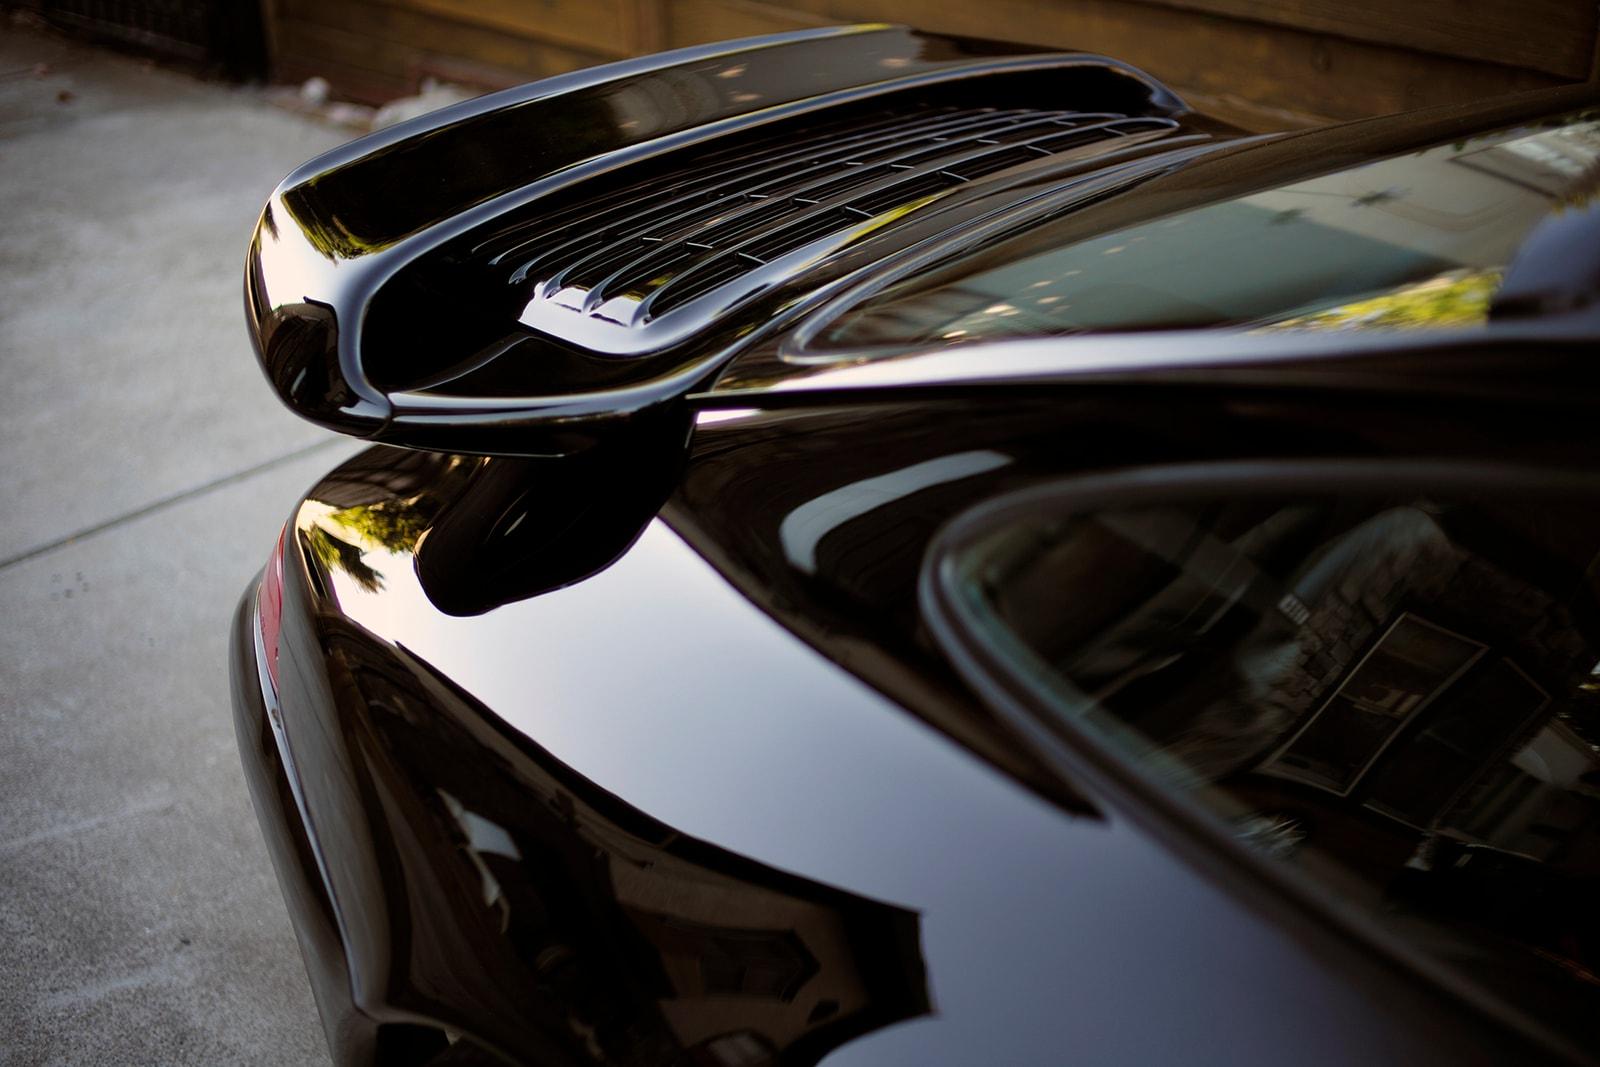 DRIVERS: Mark Arcenal's Black Porsche 911 C4S 993 Carrera HYPEBEAST CAR CLUB Vintage Air Cooled widebody